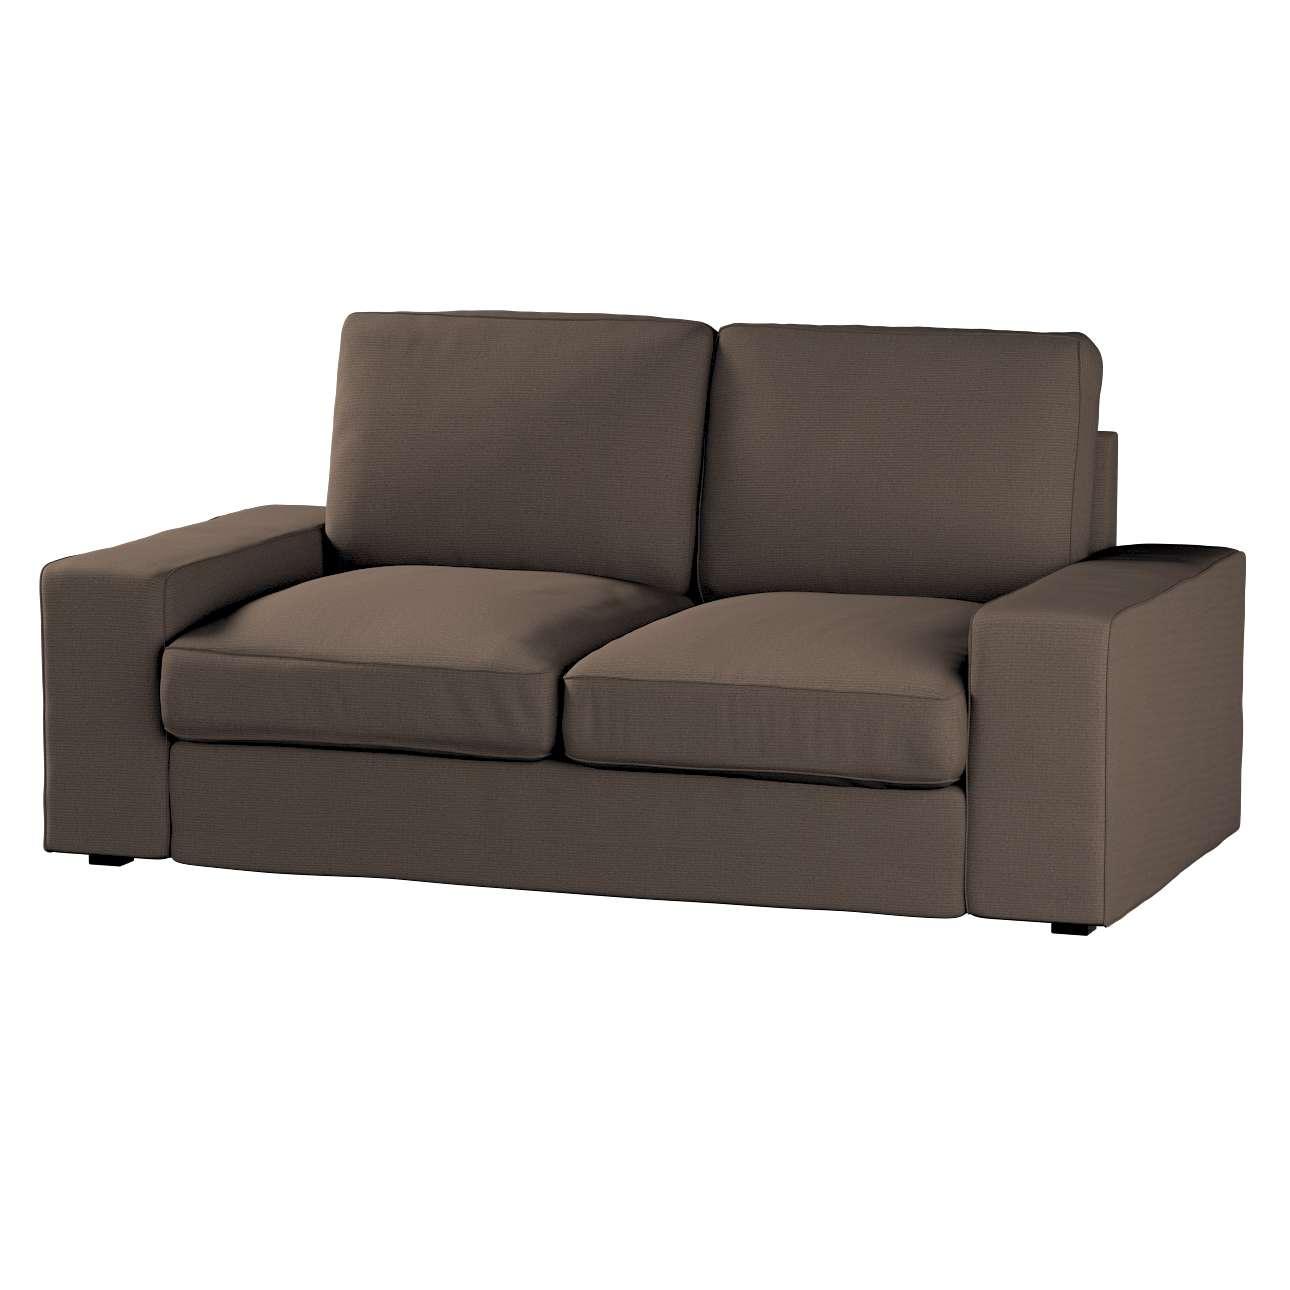 Kivik 2-Sitzer Sofabezug Sofa Kivik 2-Sitzer von der Kollektion Etna, Stoff: 705-08